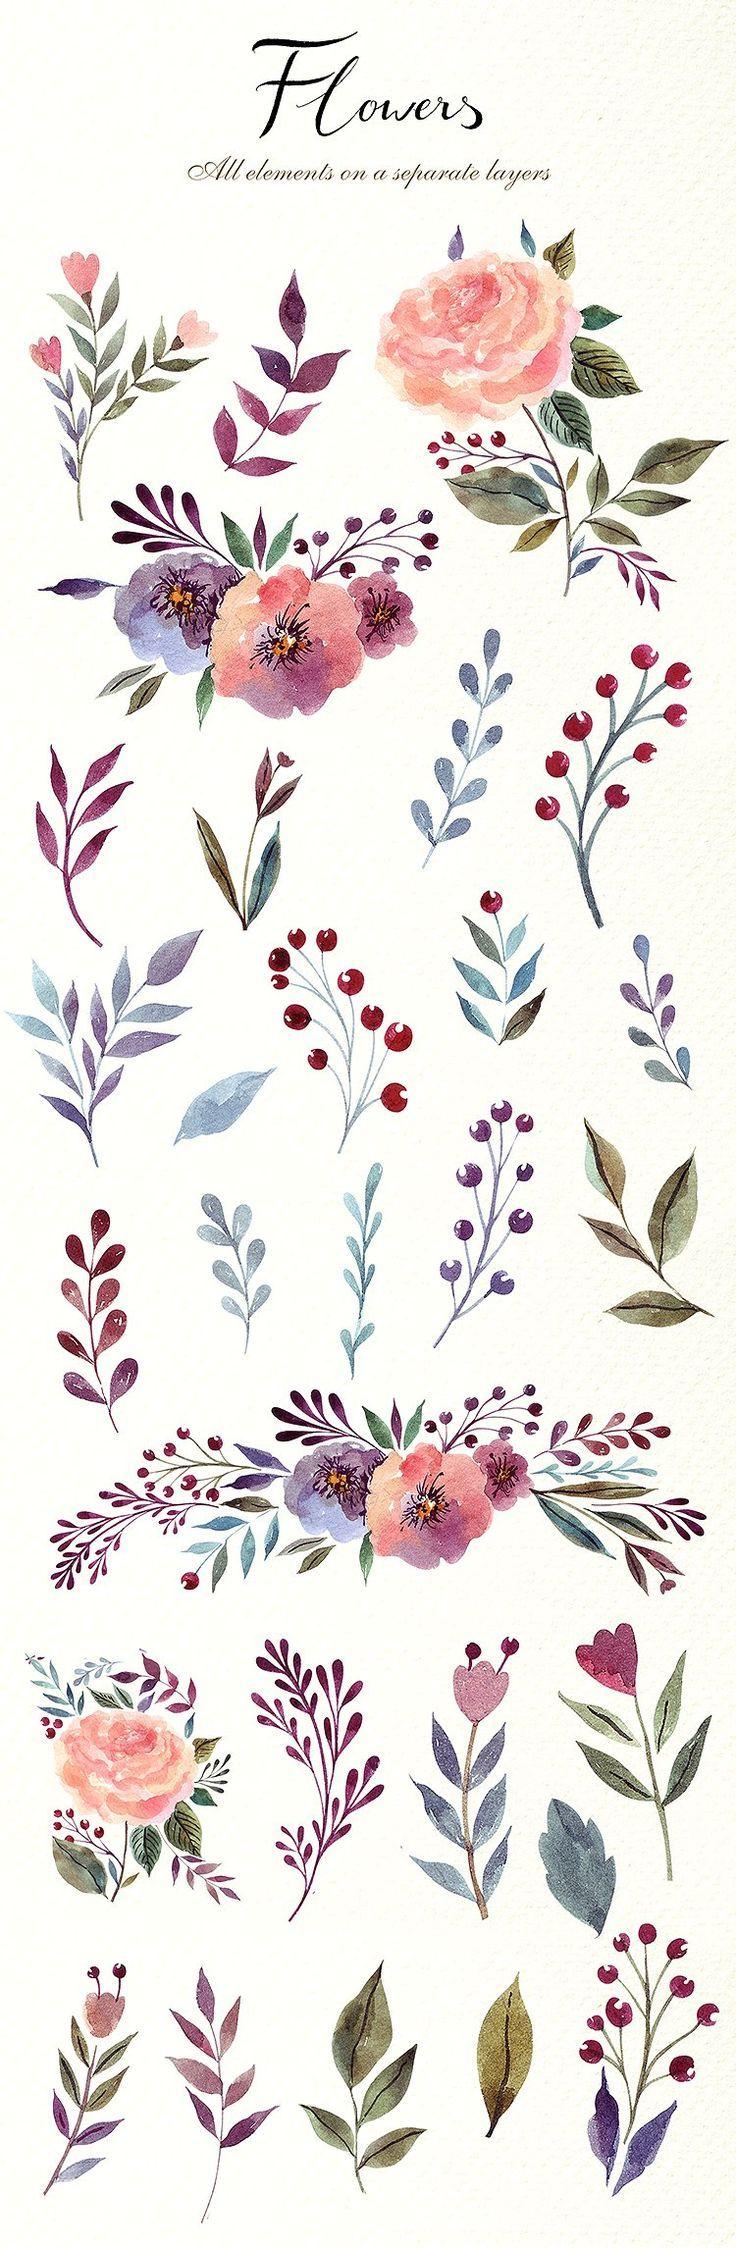 230 Watercolor graphic elements